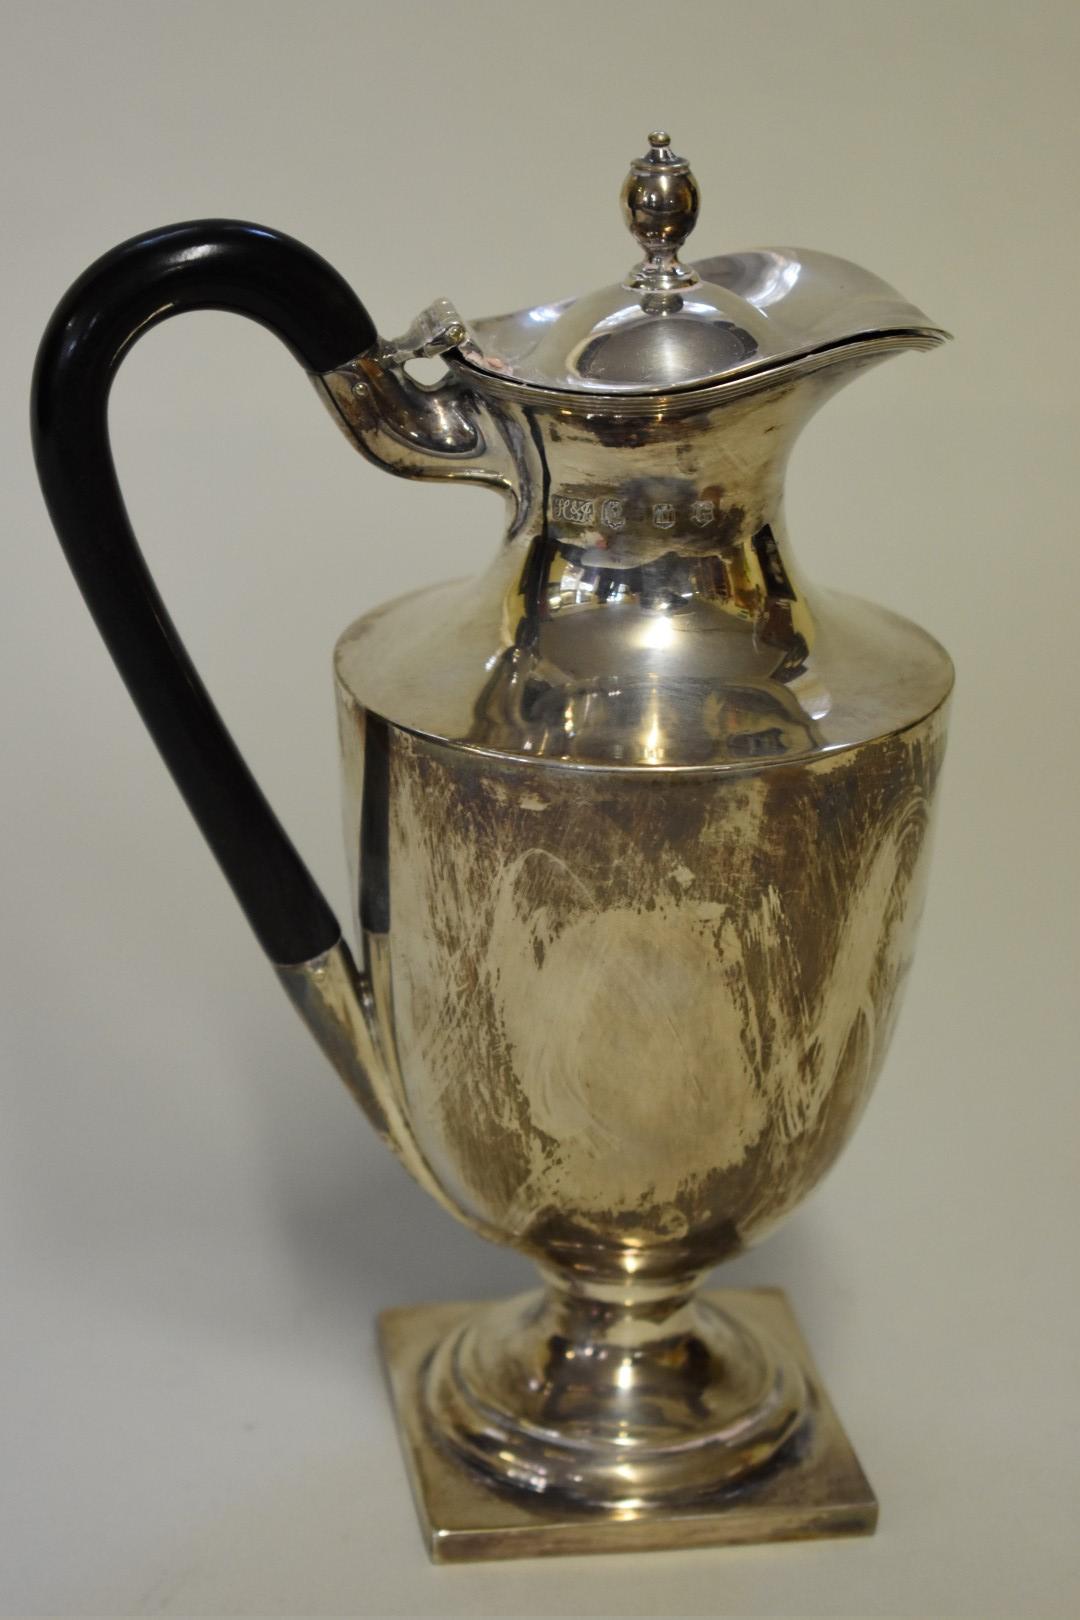 Lot 22 - Of WWI interest: aScottish silver hot water jug, byHamilton & Inches,Edinburgh 1912,inscribed